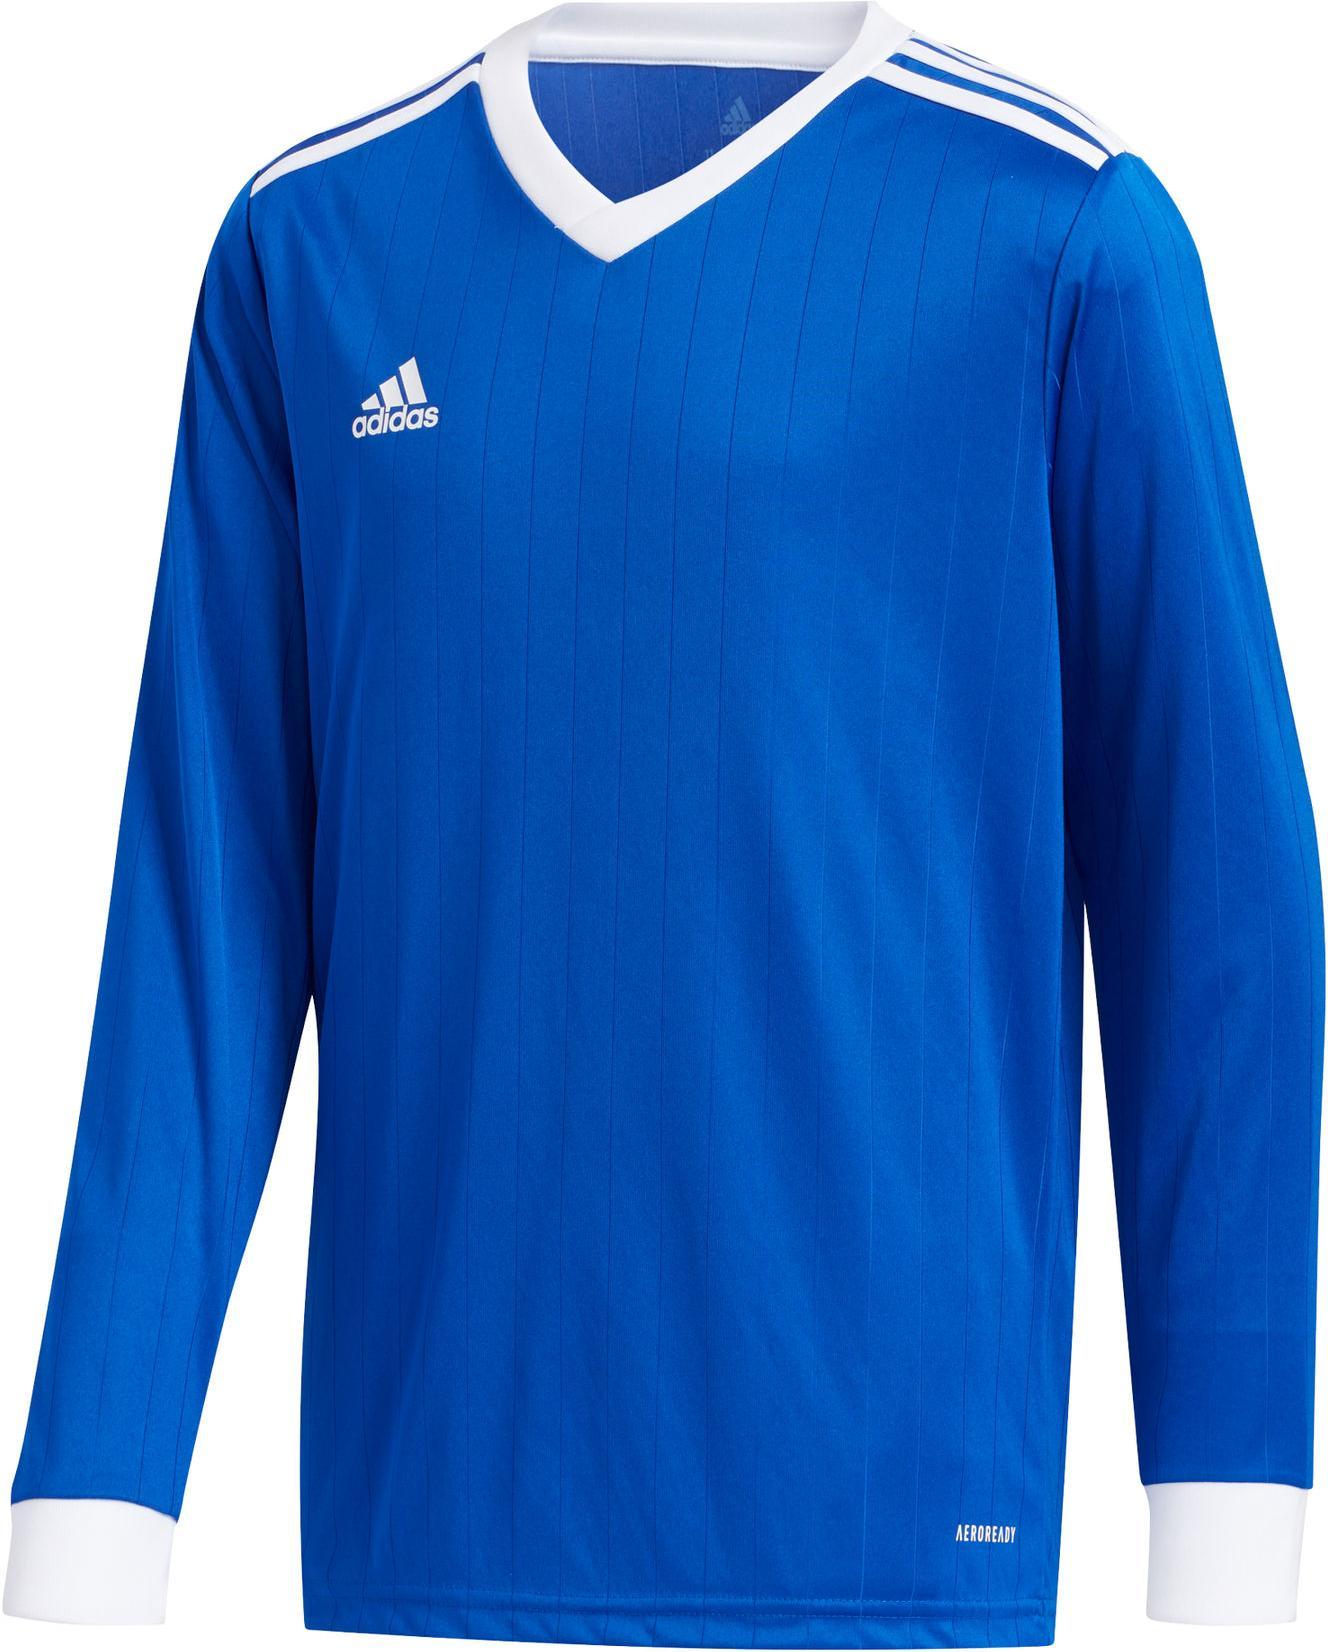 Long-sleeve shirt adidas Y Tabela 18 Jersey LS - Top4Football.com